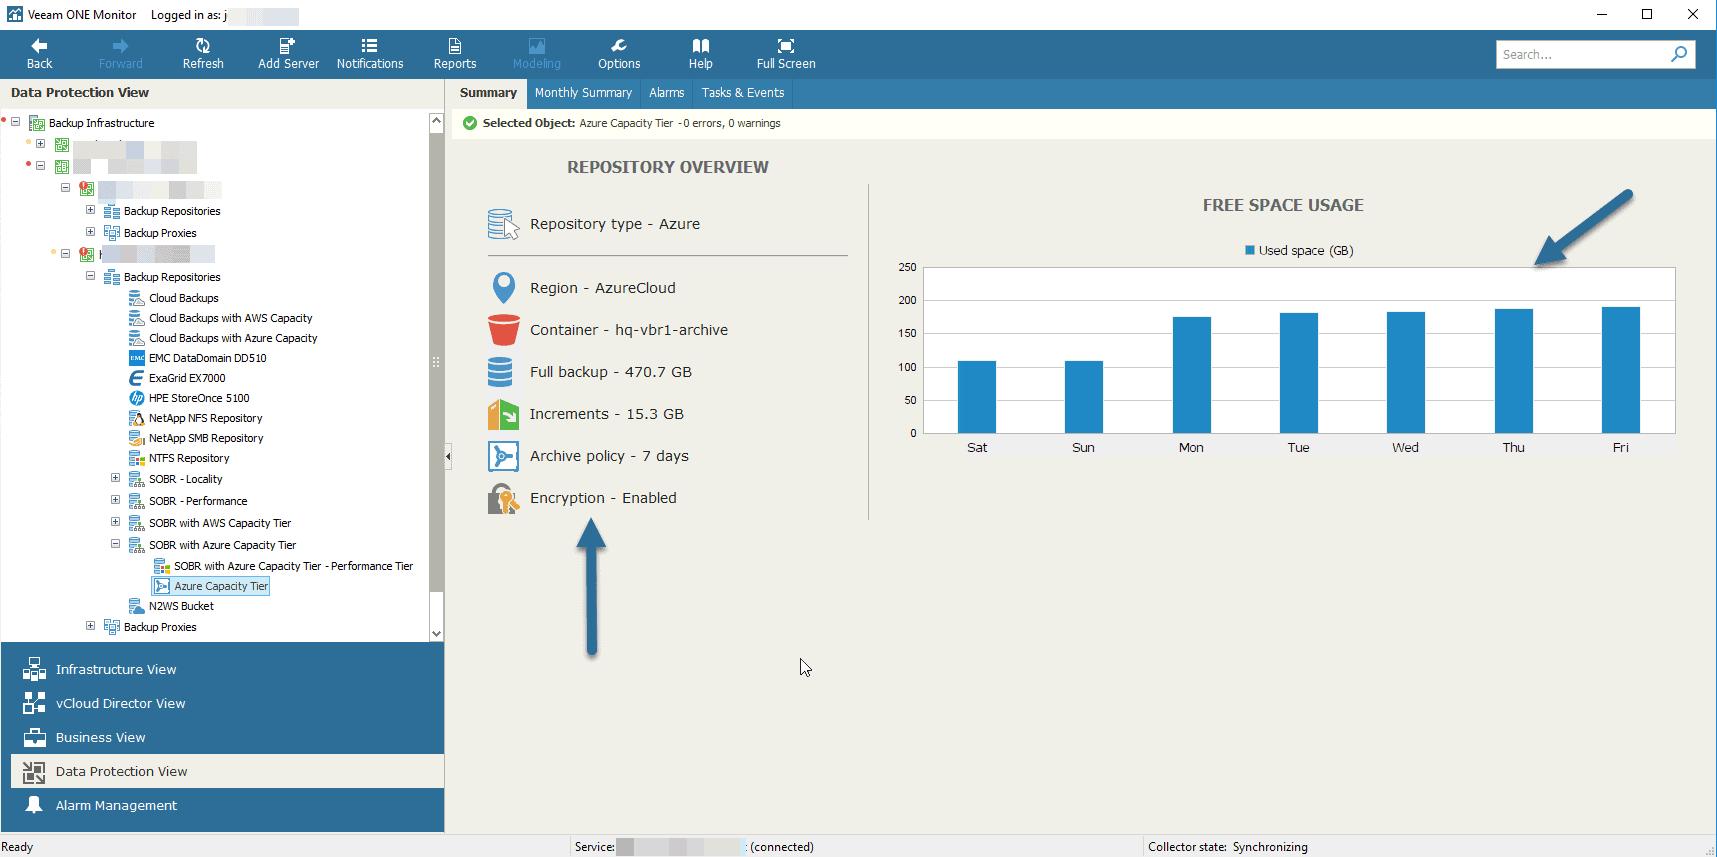 Veeam: Cloud Tier/Capacity Tier in Microsoft Azure Blob – Microsoft